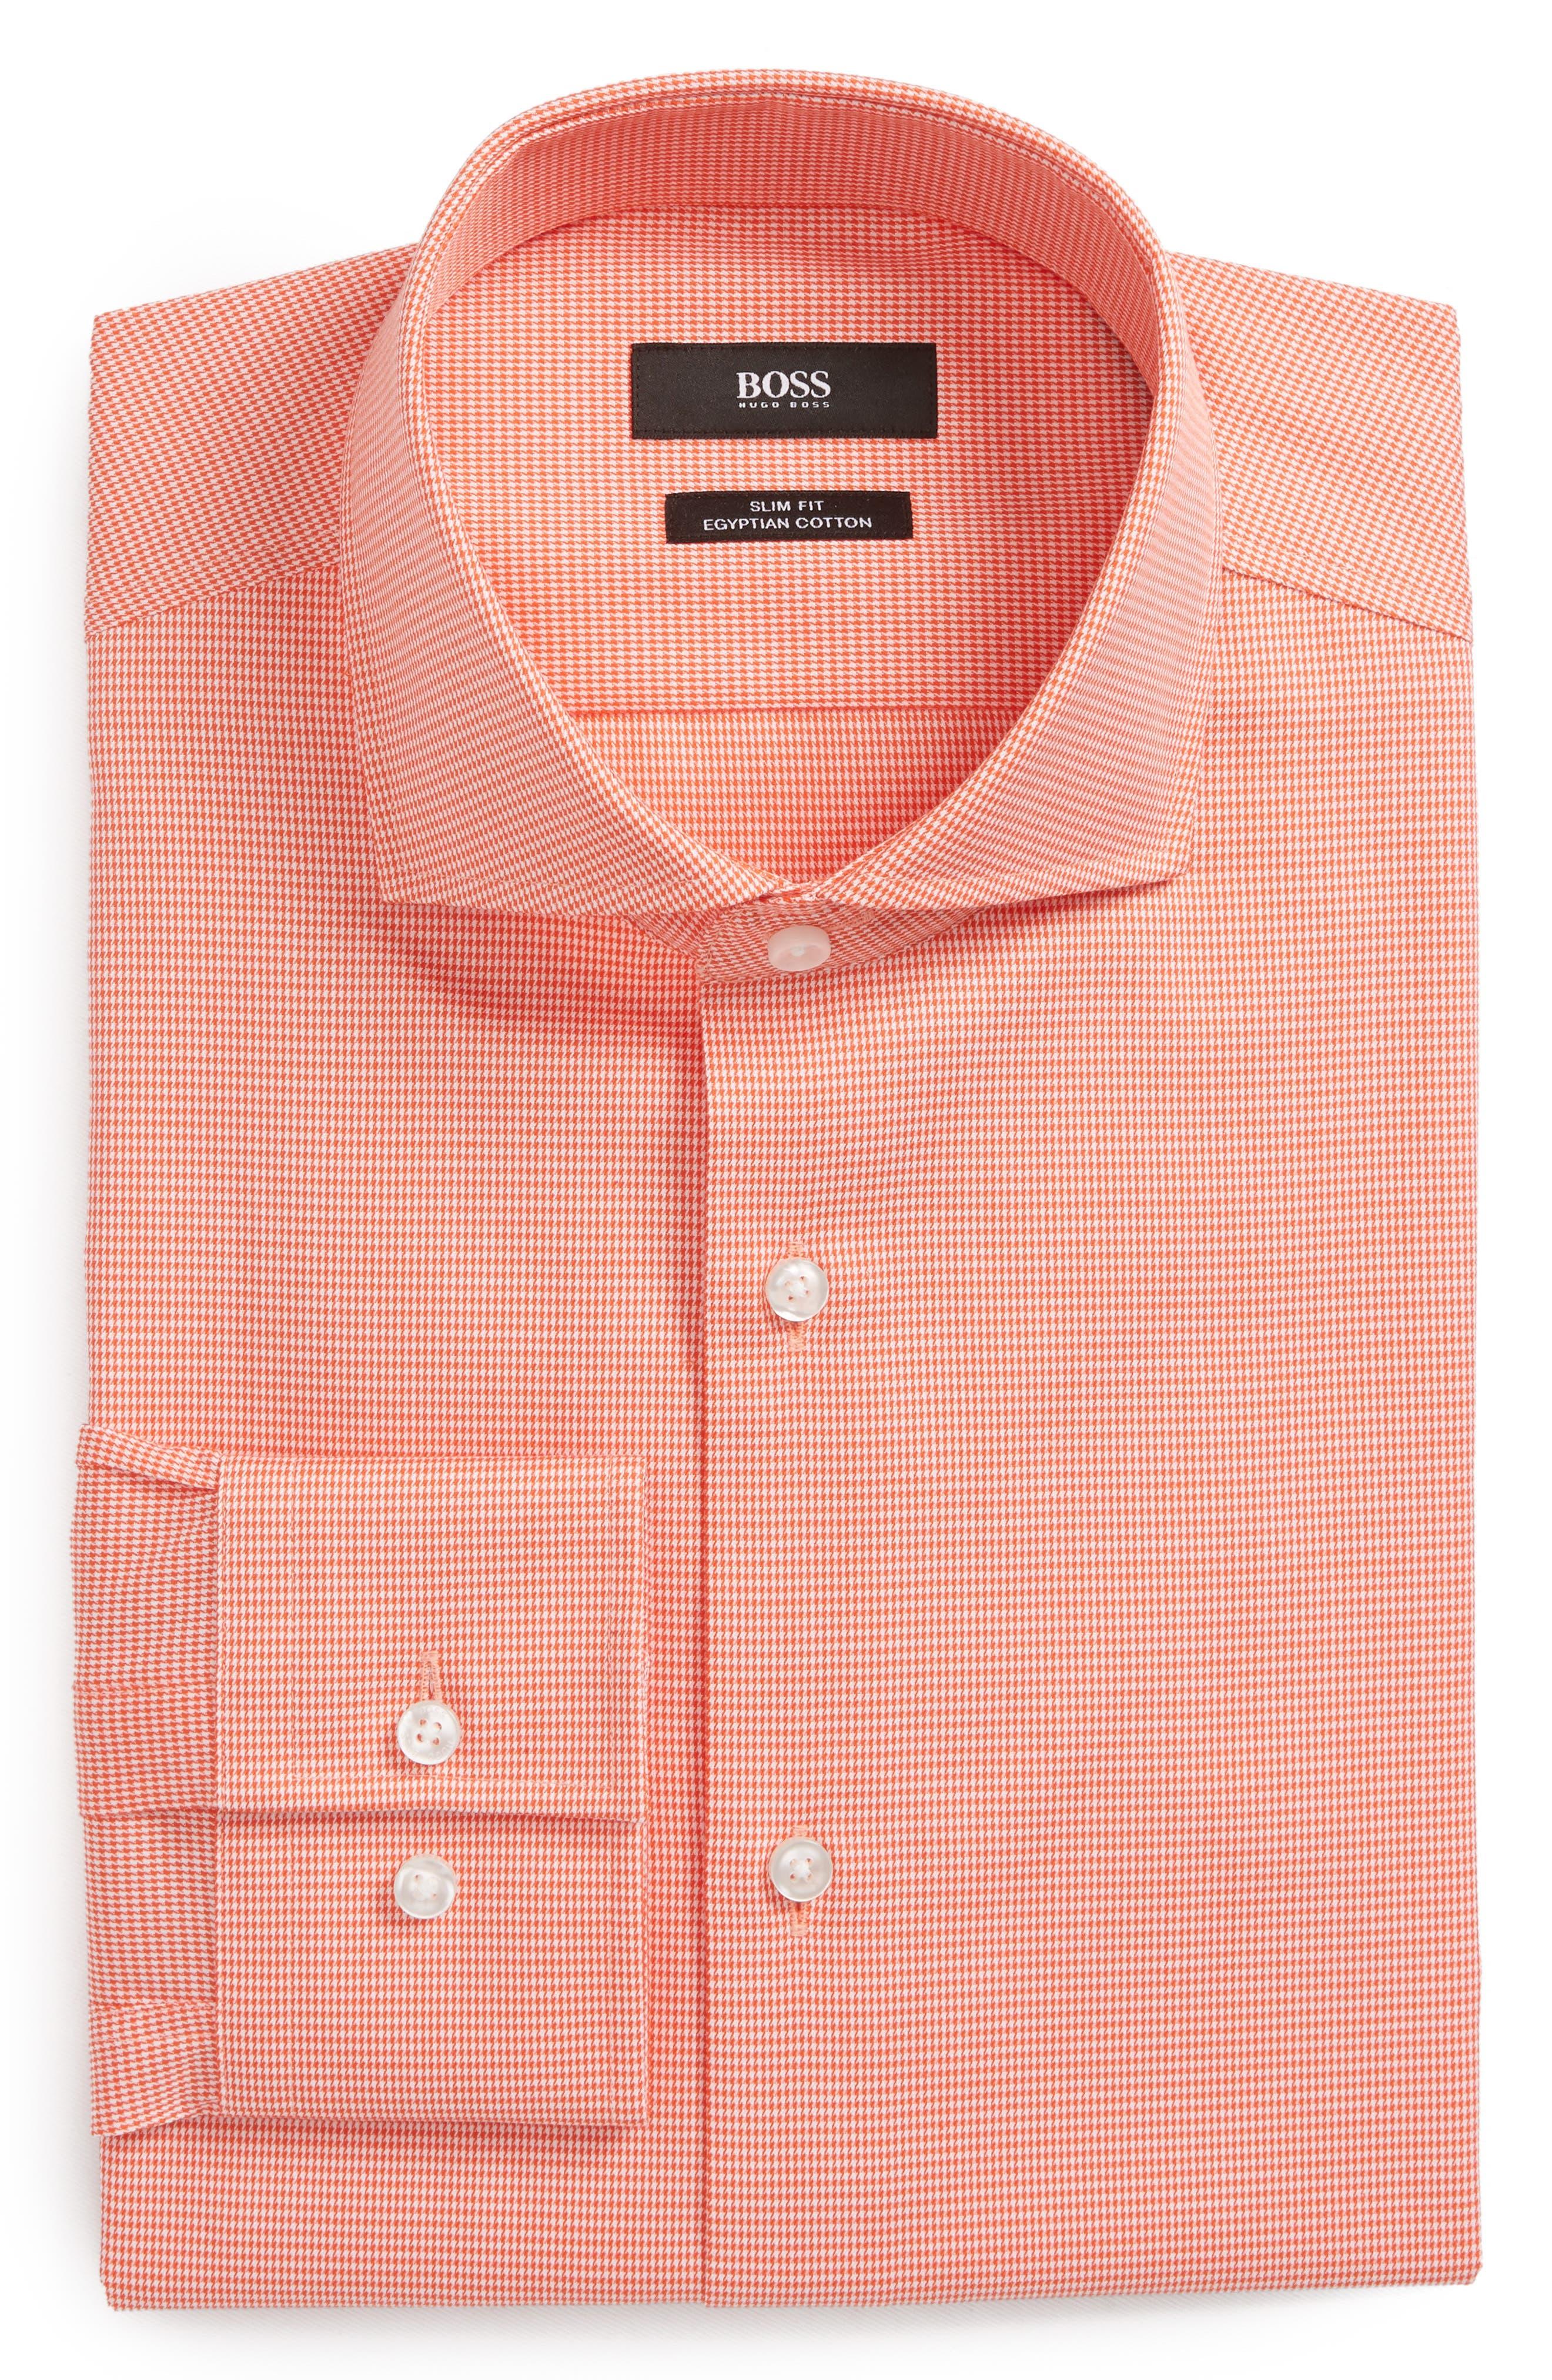 Jason Slim Fit Houndstooth Dress Shirt,                         Main,                         color, Orange